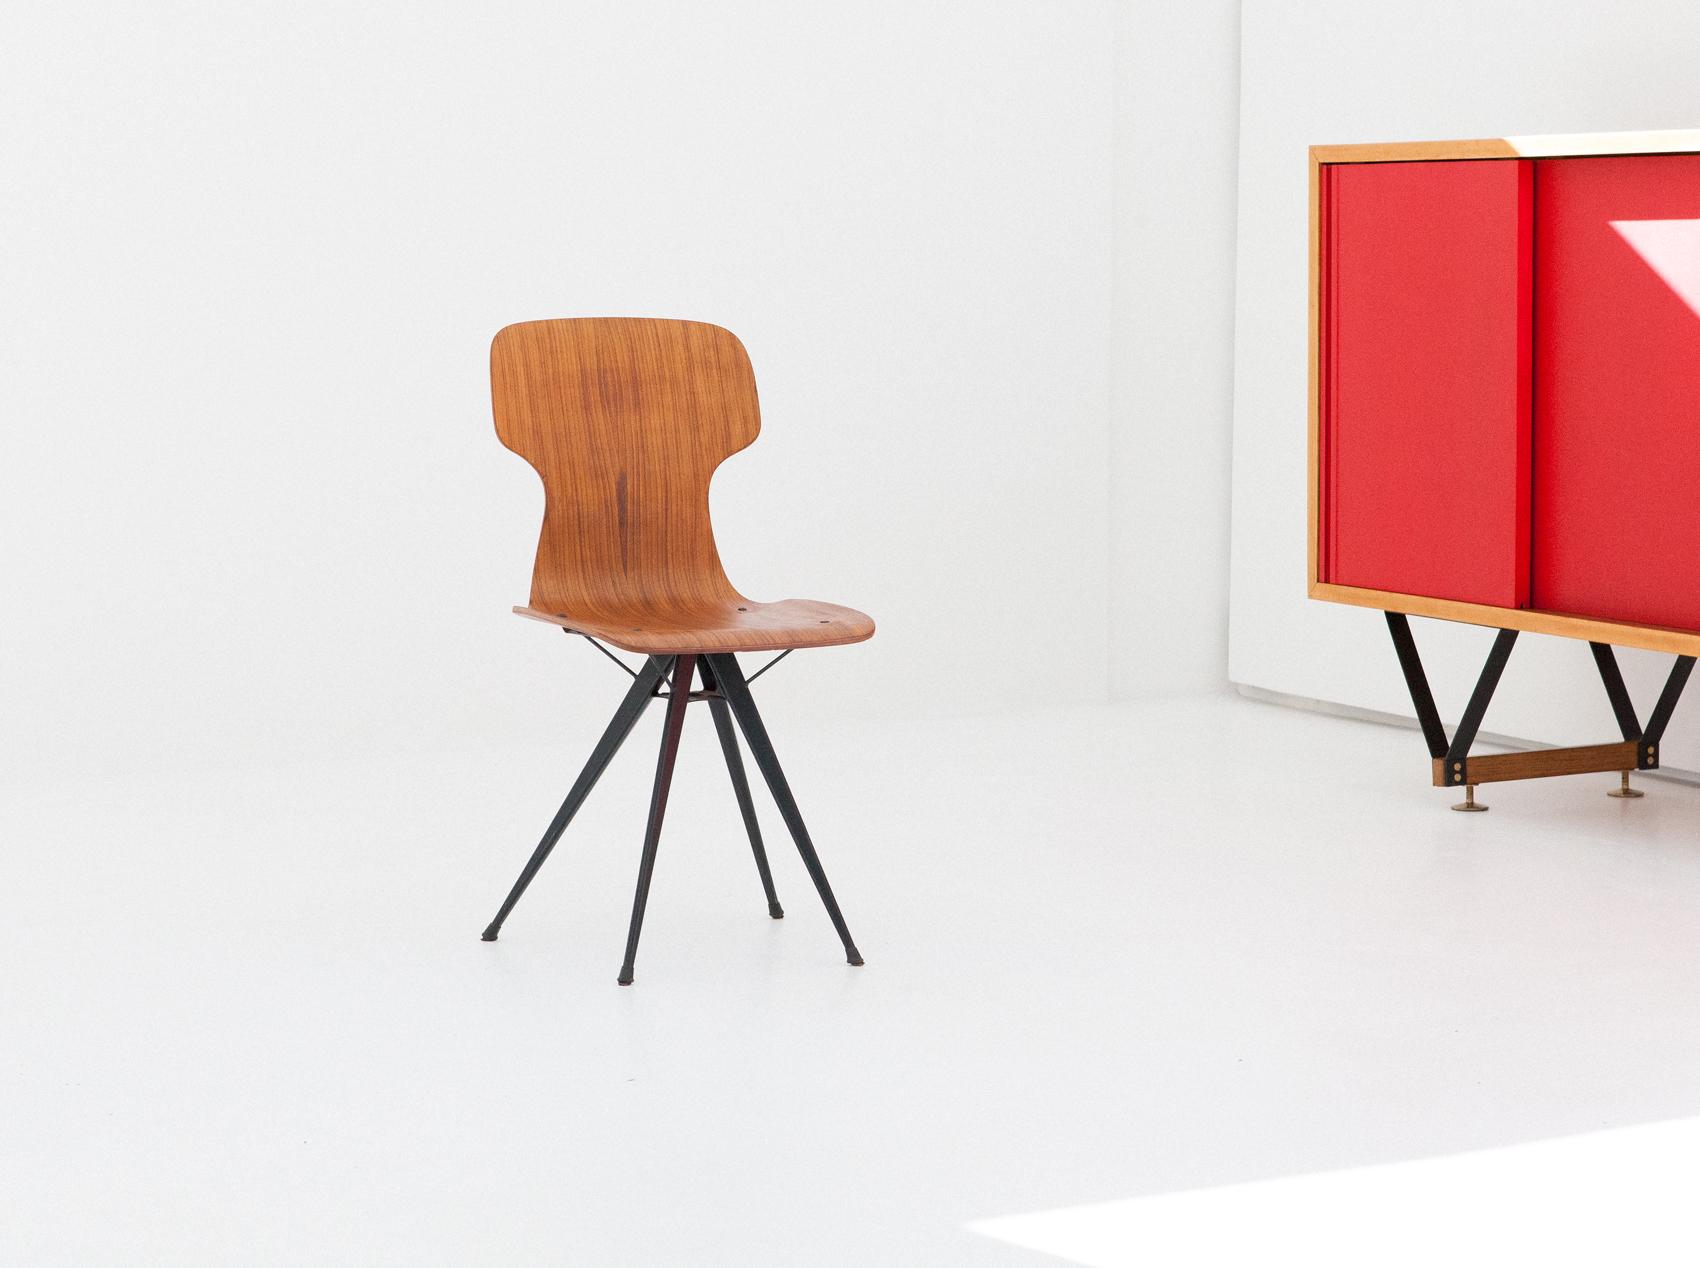 italian-curved-teak-conical-iron-legs-chair-SE281